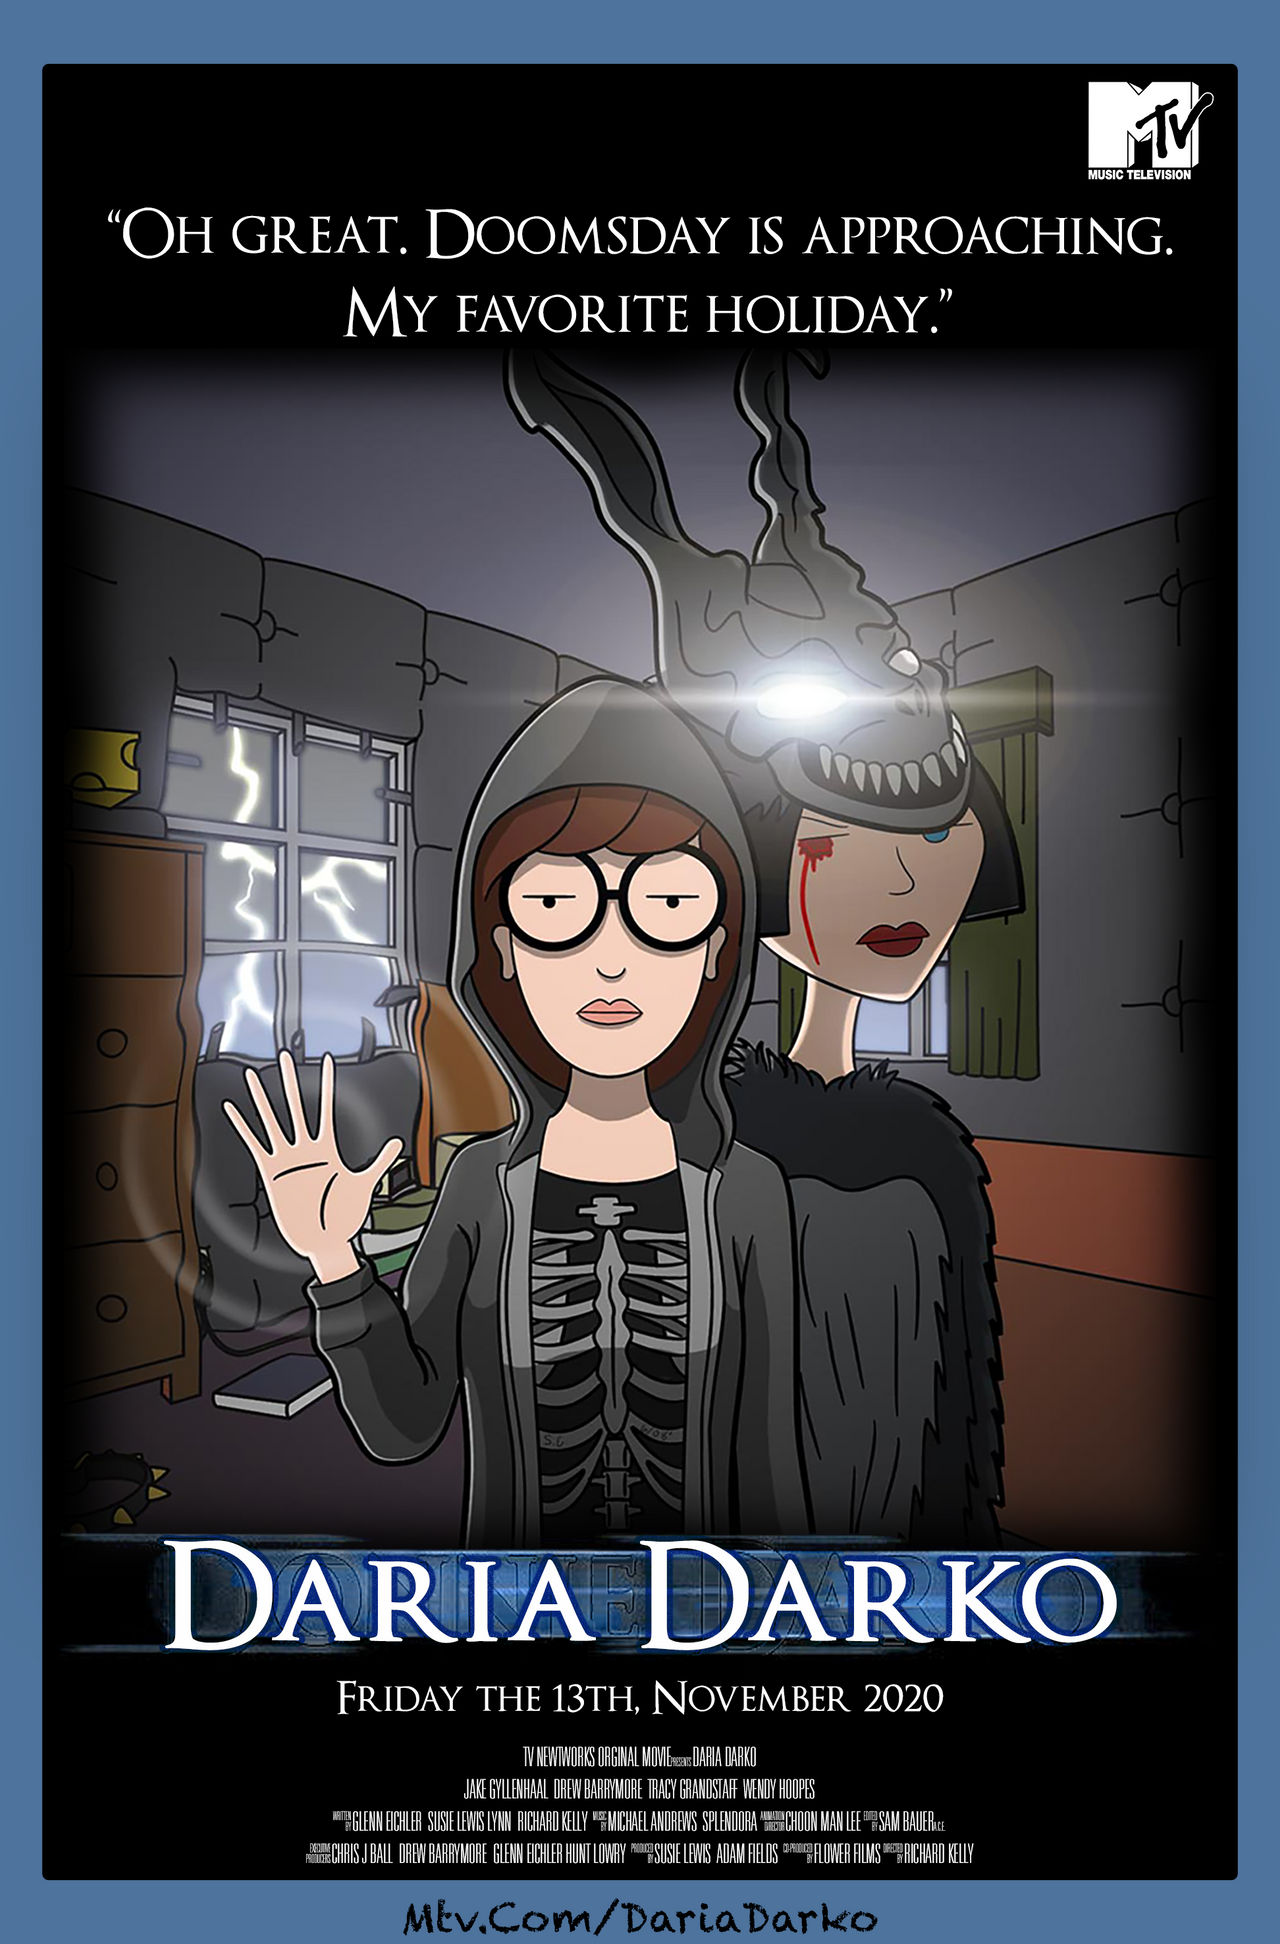 Movie Poster Daria Darko Grace Tauber gwt357